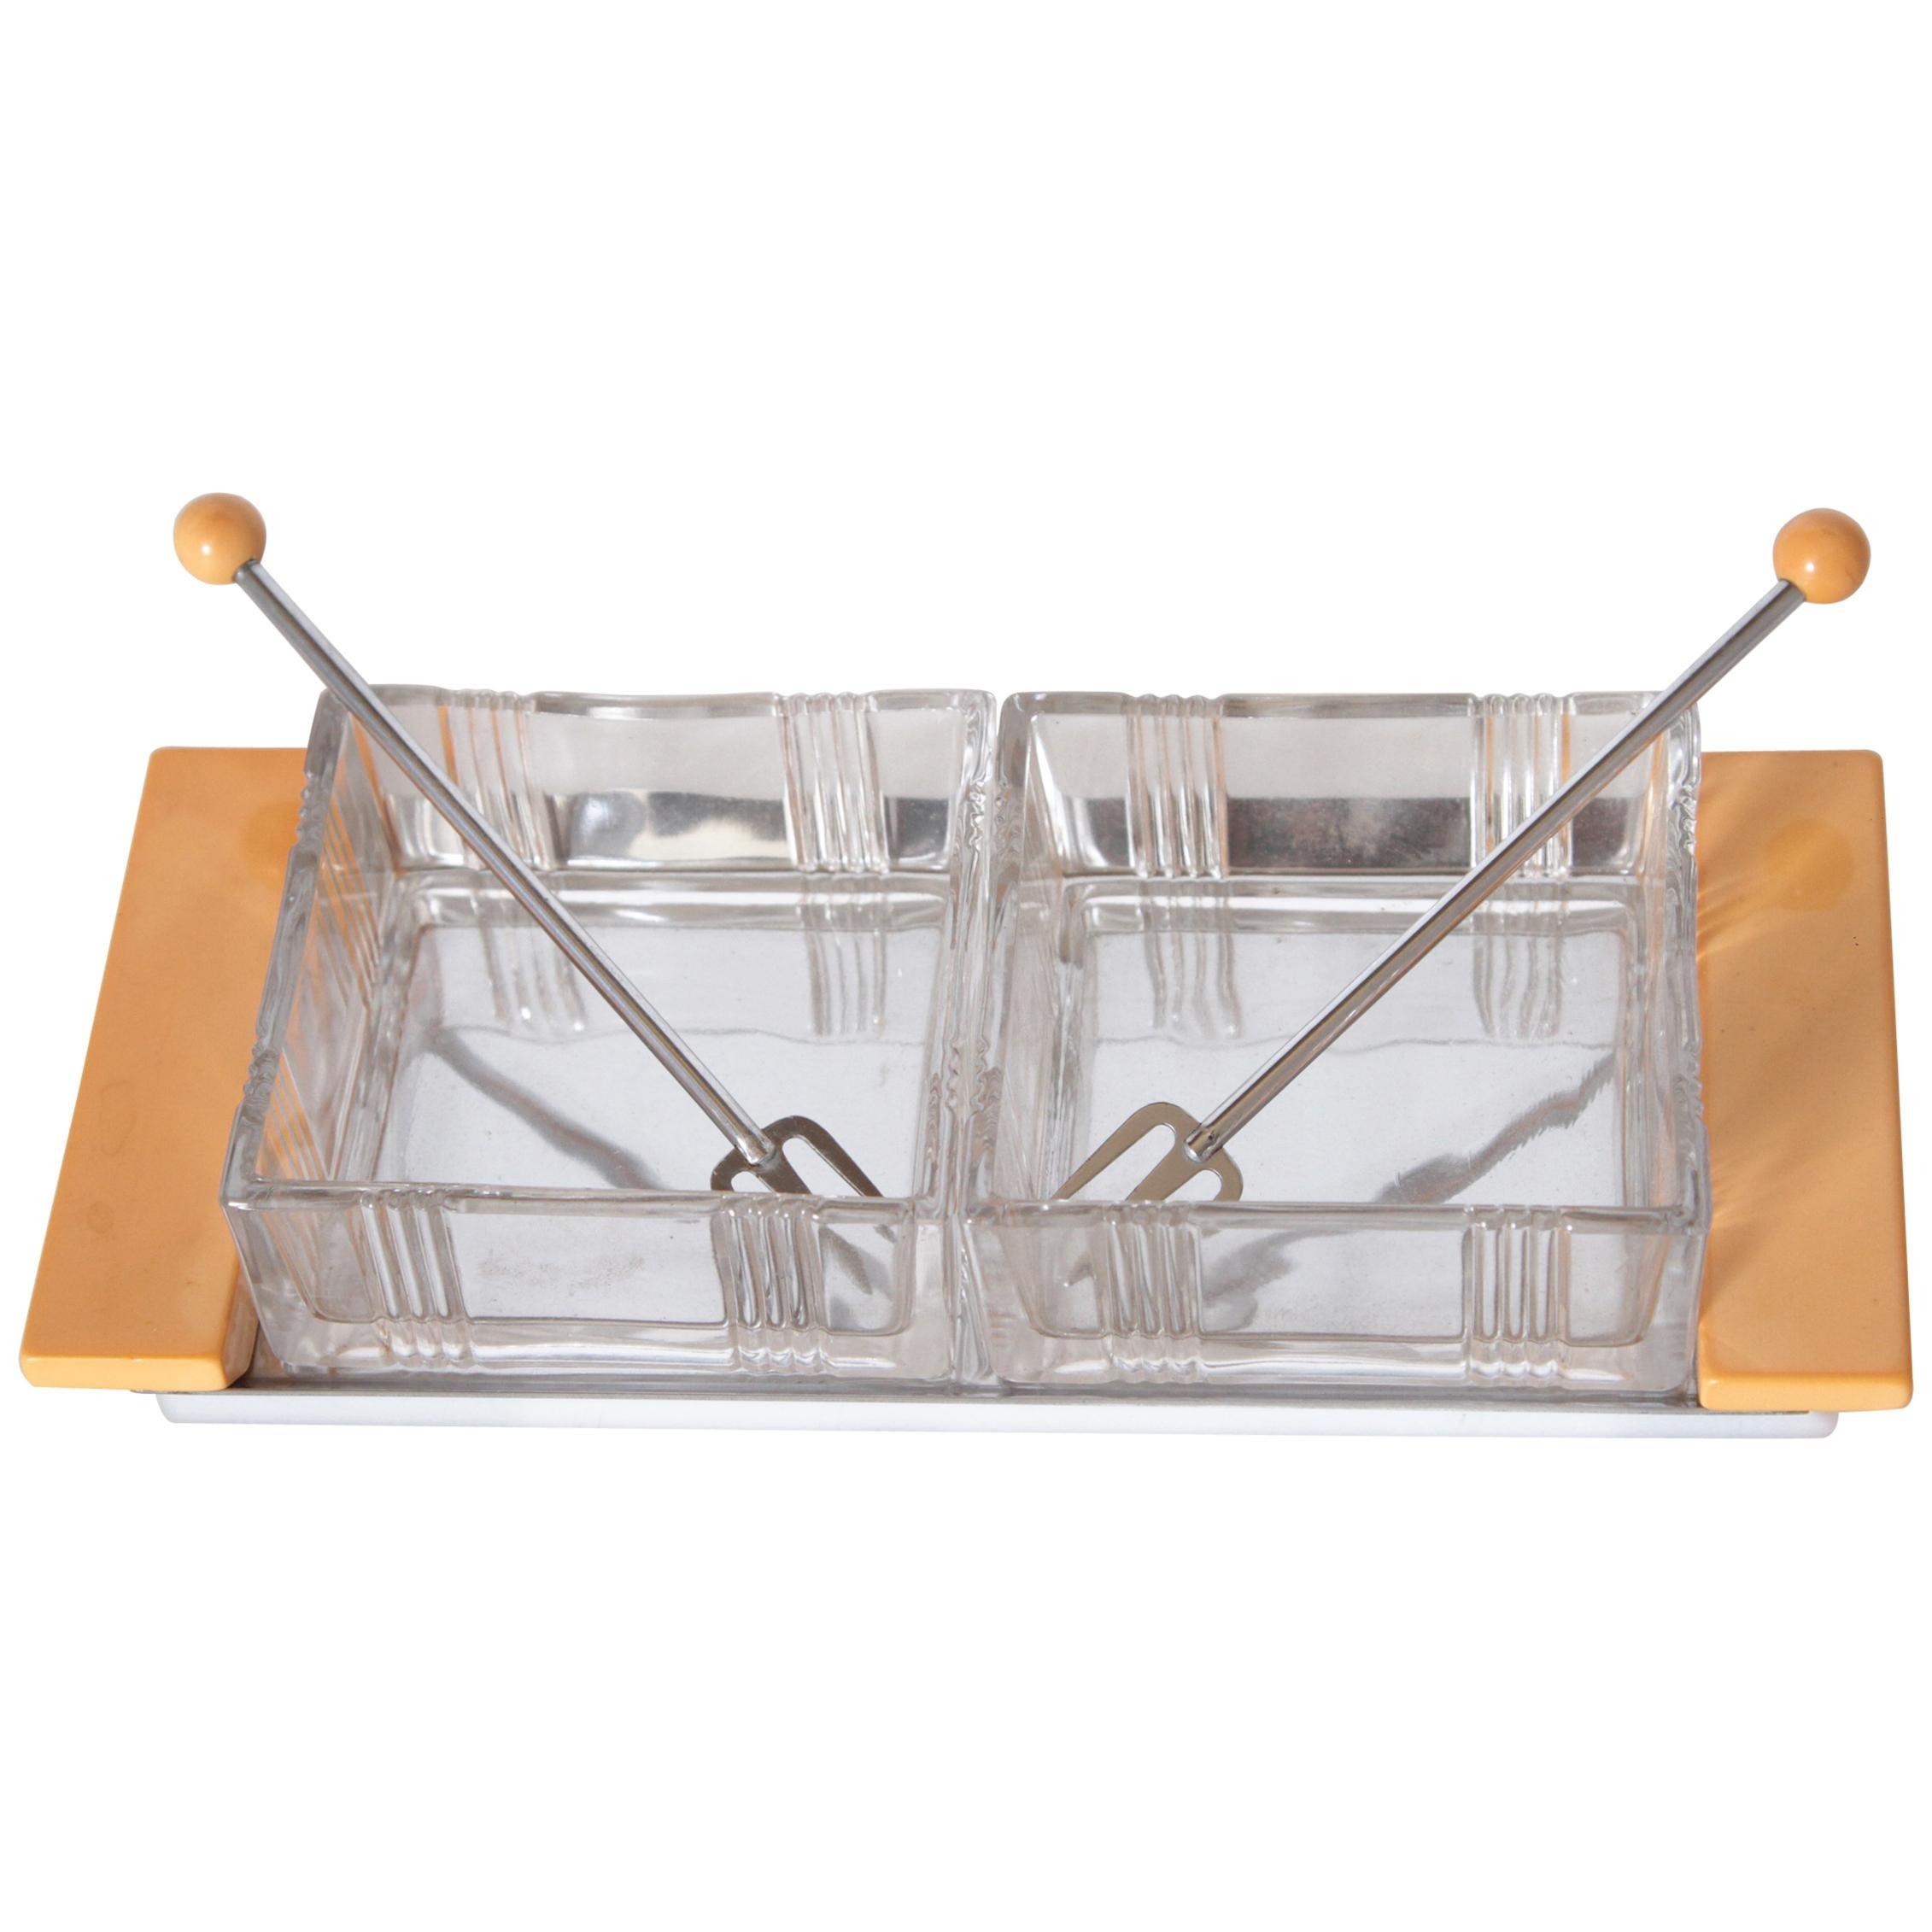 Machine Age Art Deco Manning Bowman Pickle Service Original Box Unused